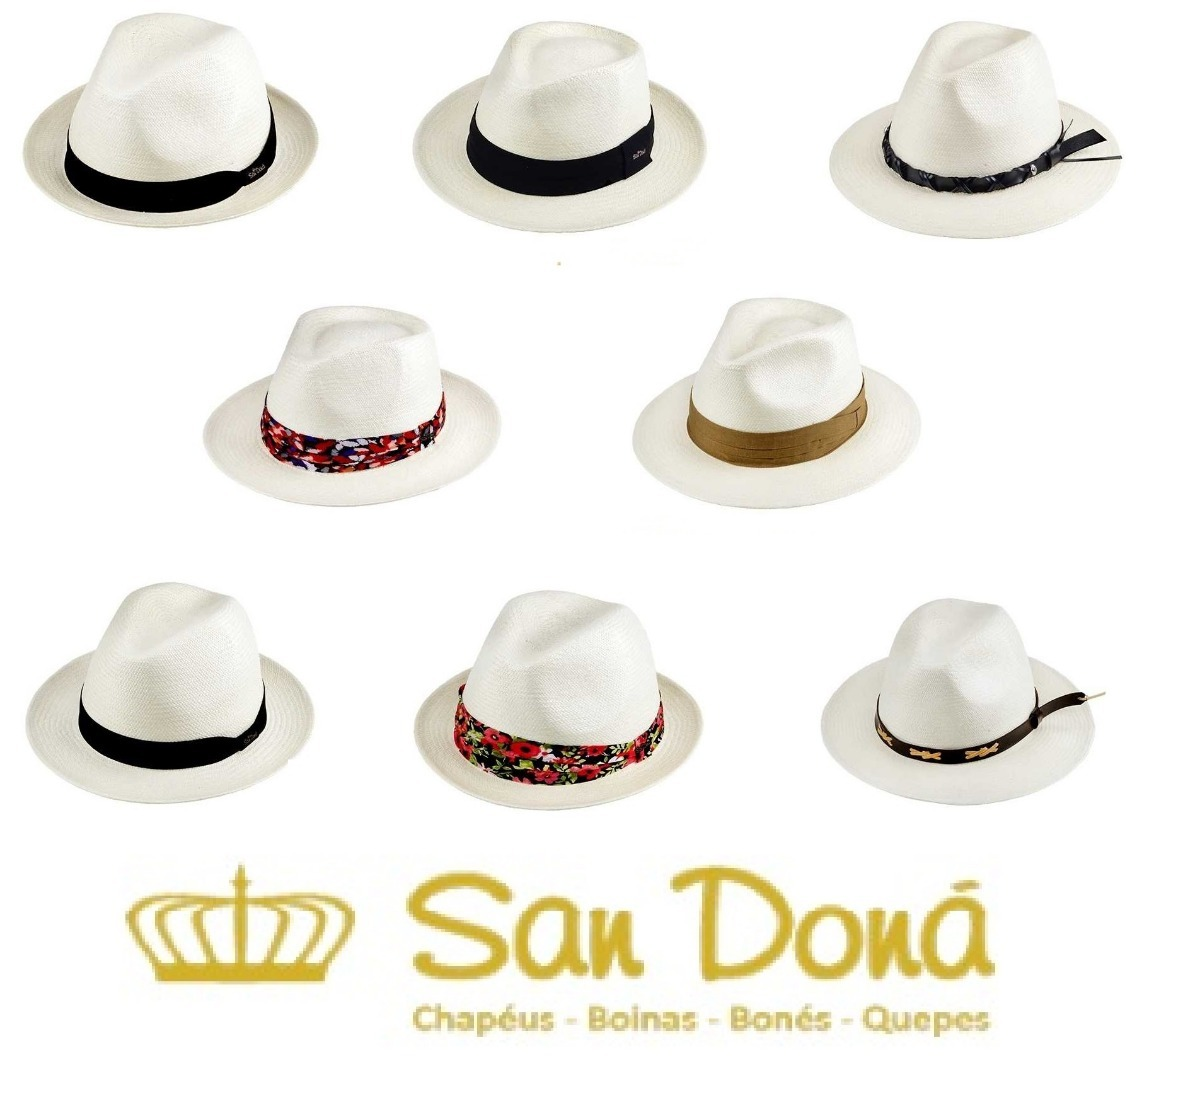 Chapéus Legítimo Panamá Original Equador 54 A 62 San Doná - R  336 ... 341eac31b3d